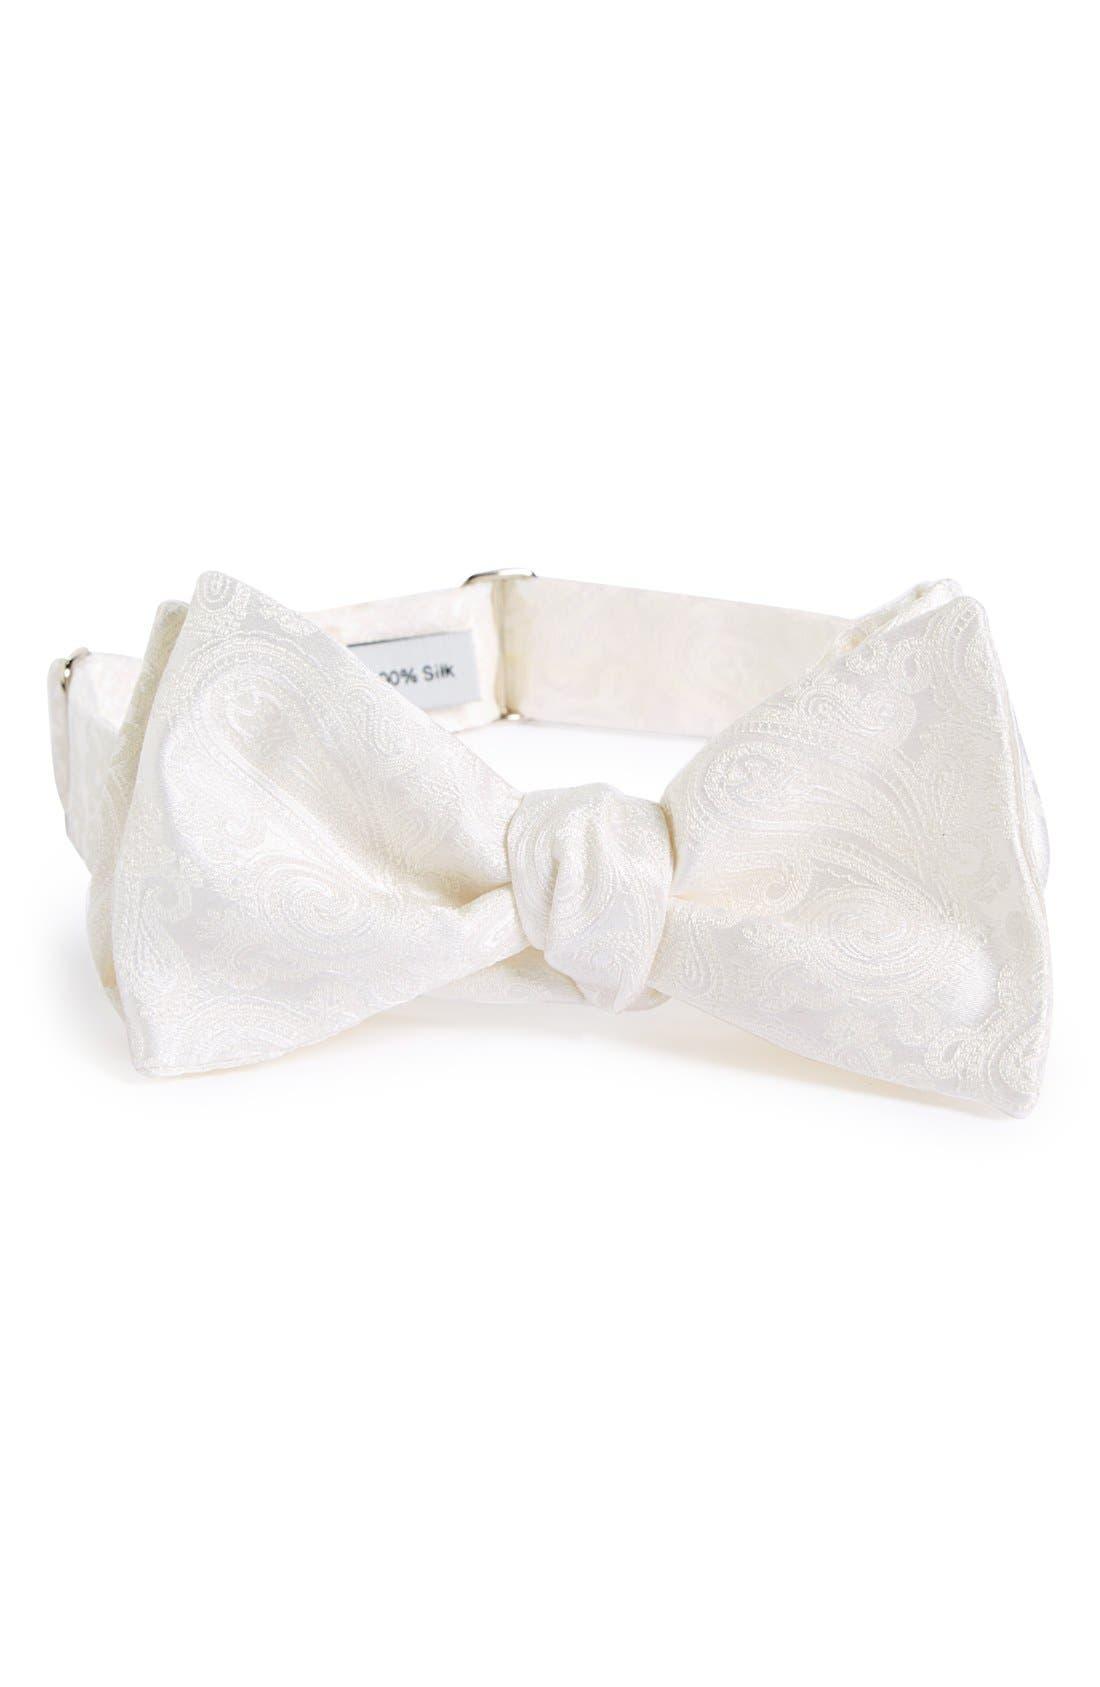 Paisley Silk Bow Tie,                         Main,                         color, White